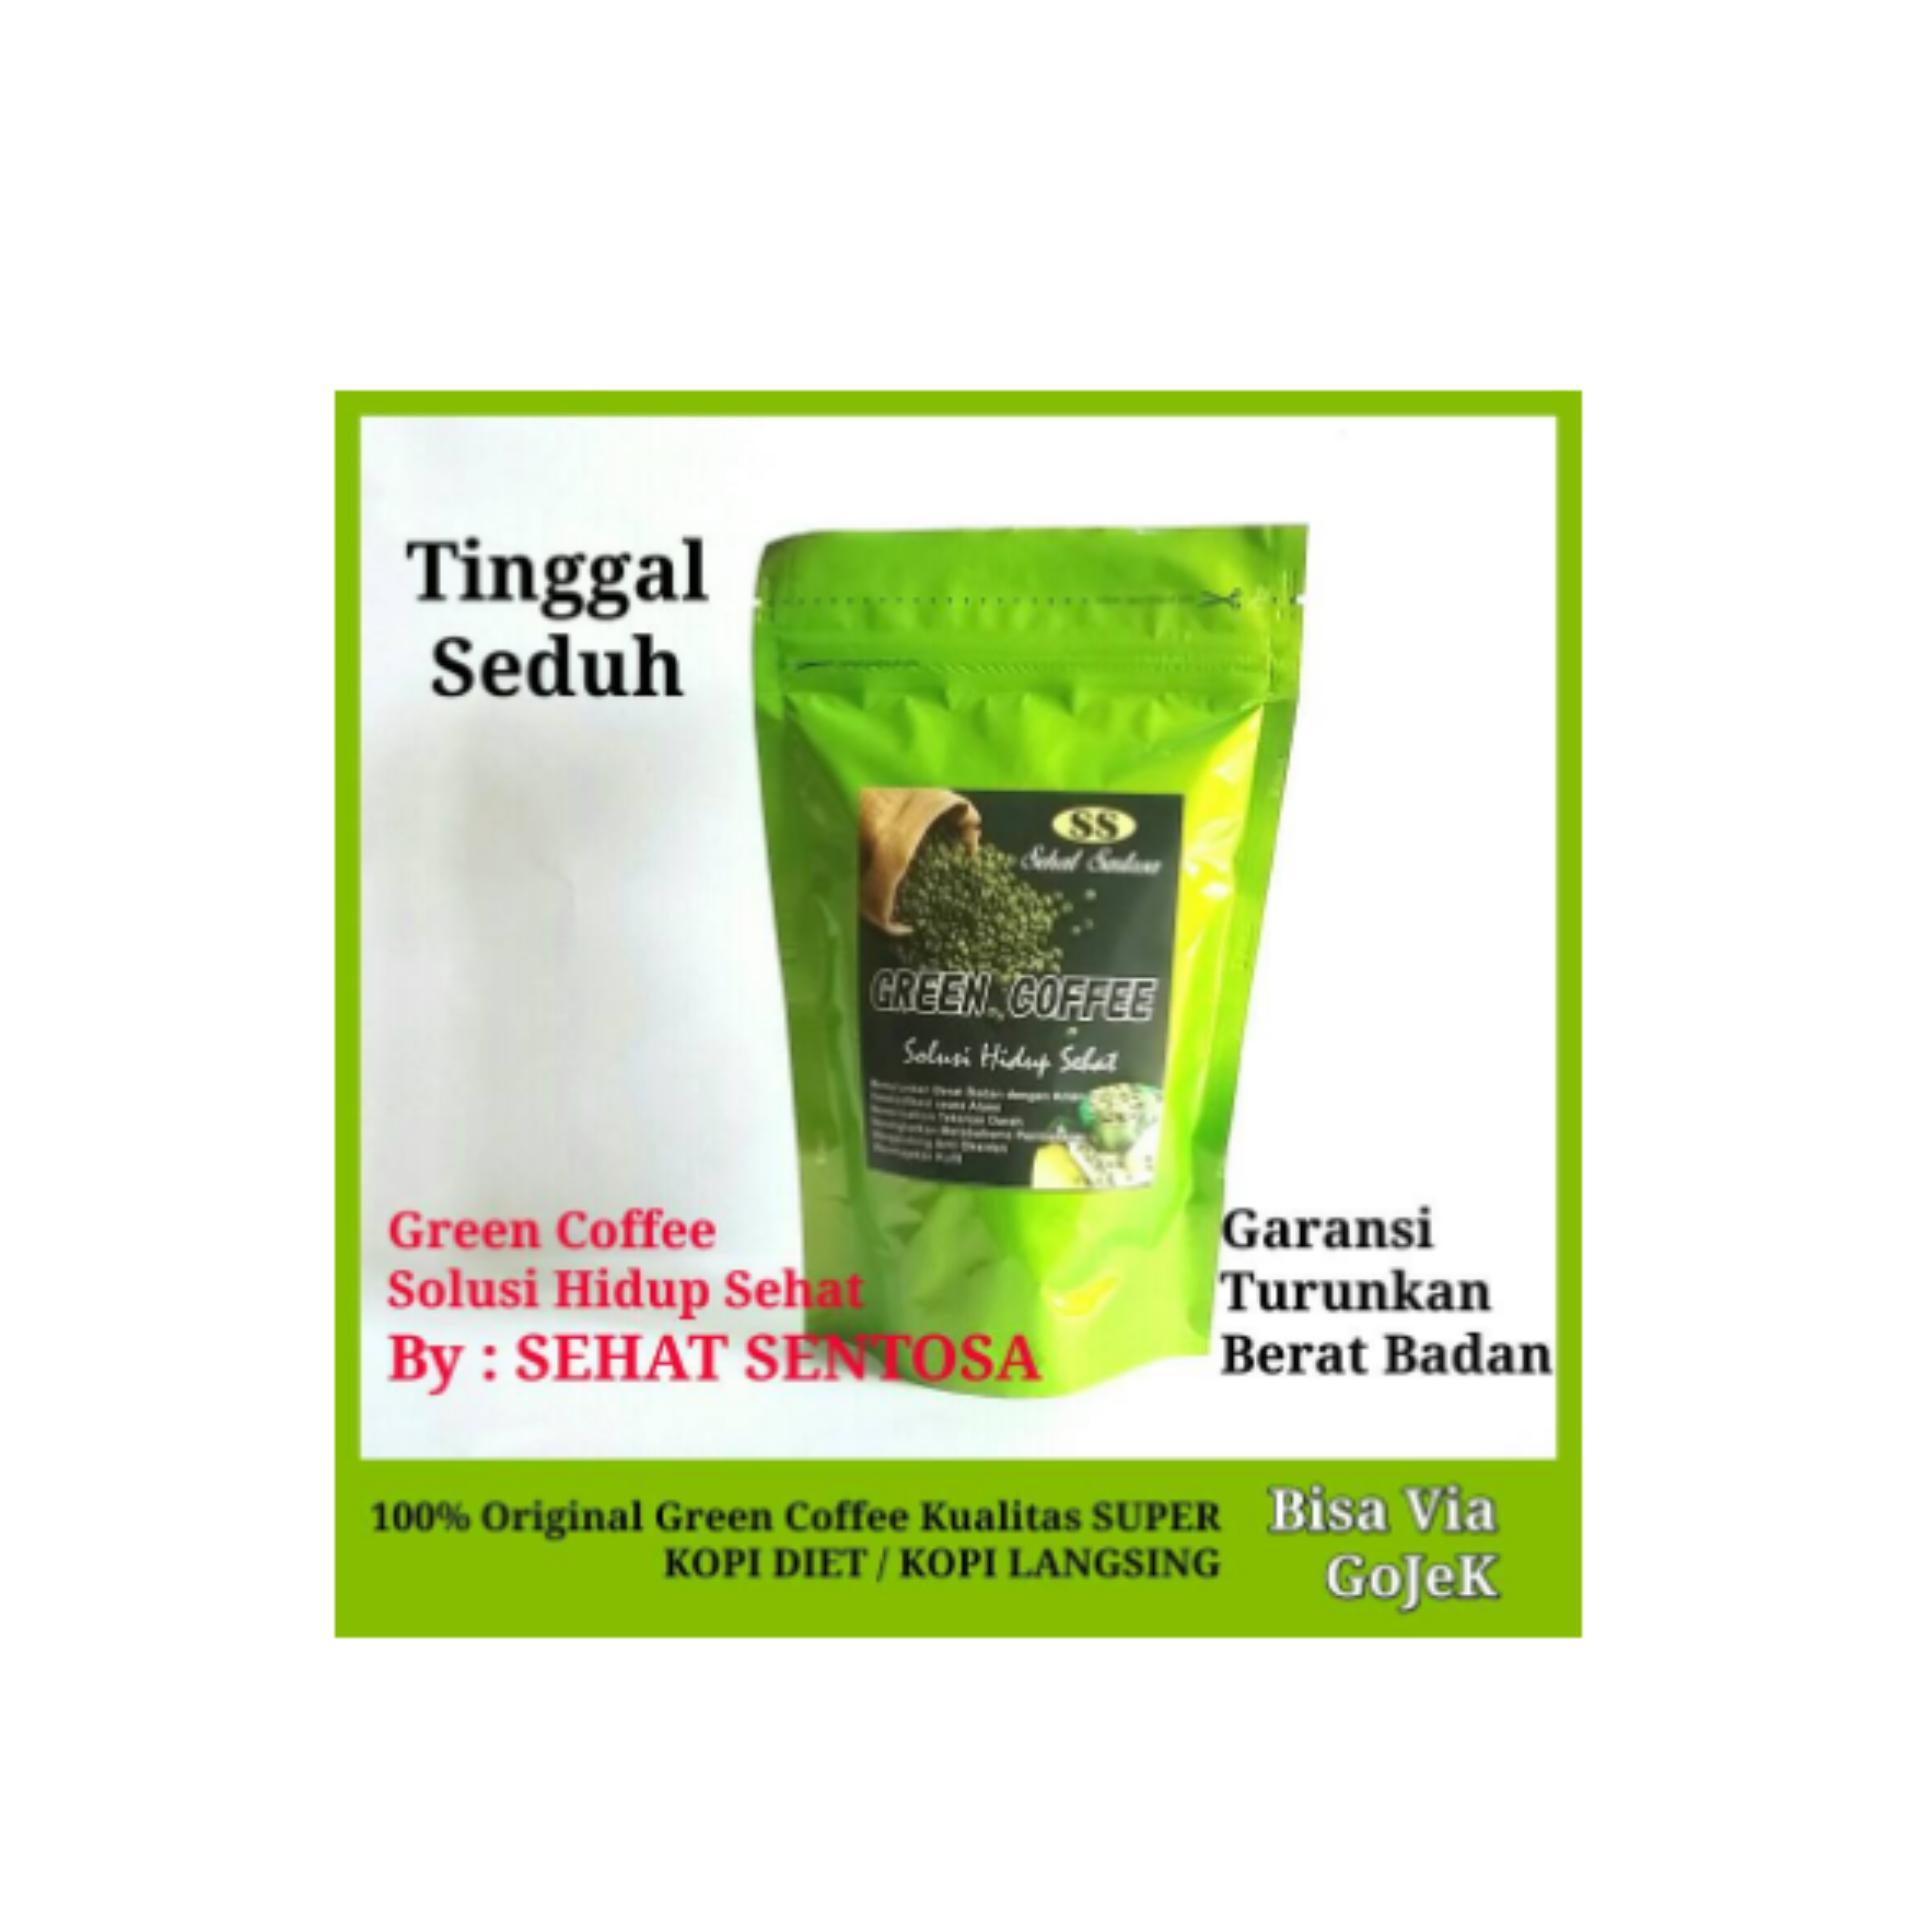 Eshop Checker Biji Kopi Hijau Murni Green Bean Coffee Diet Alami Pelangsing